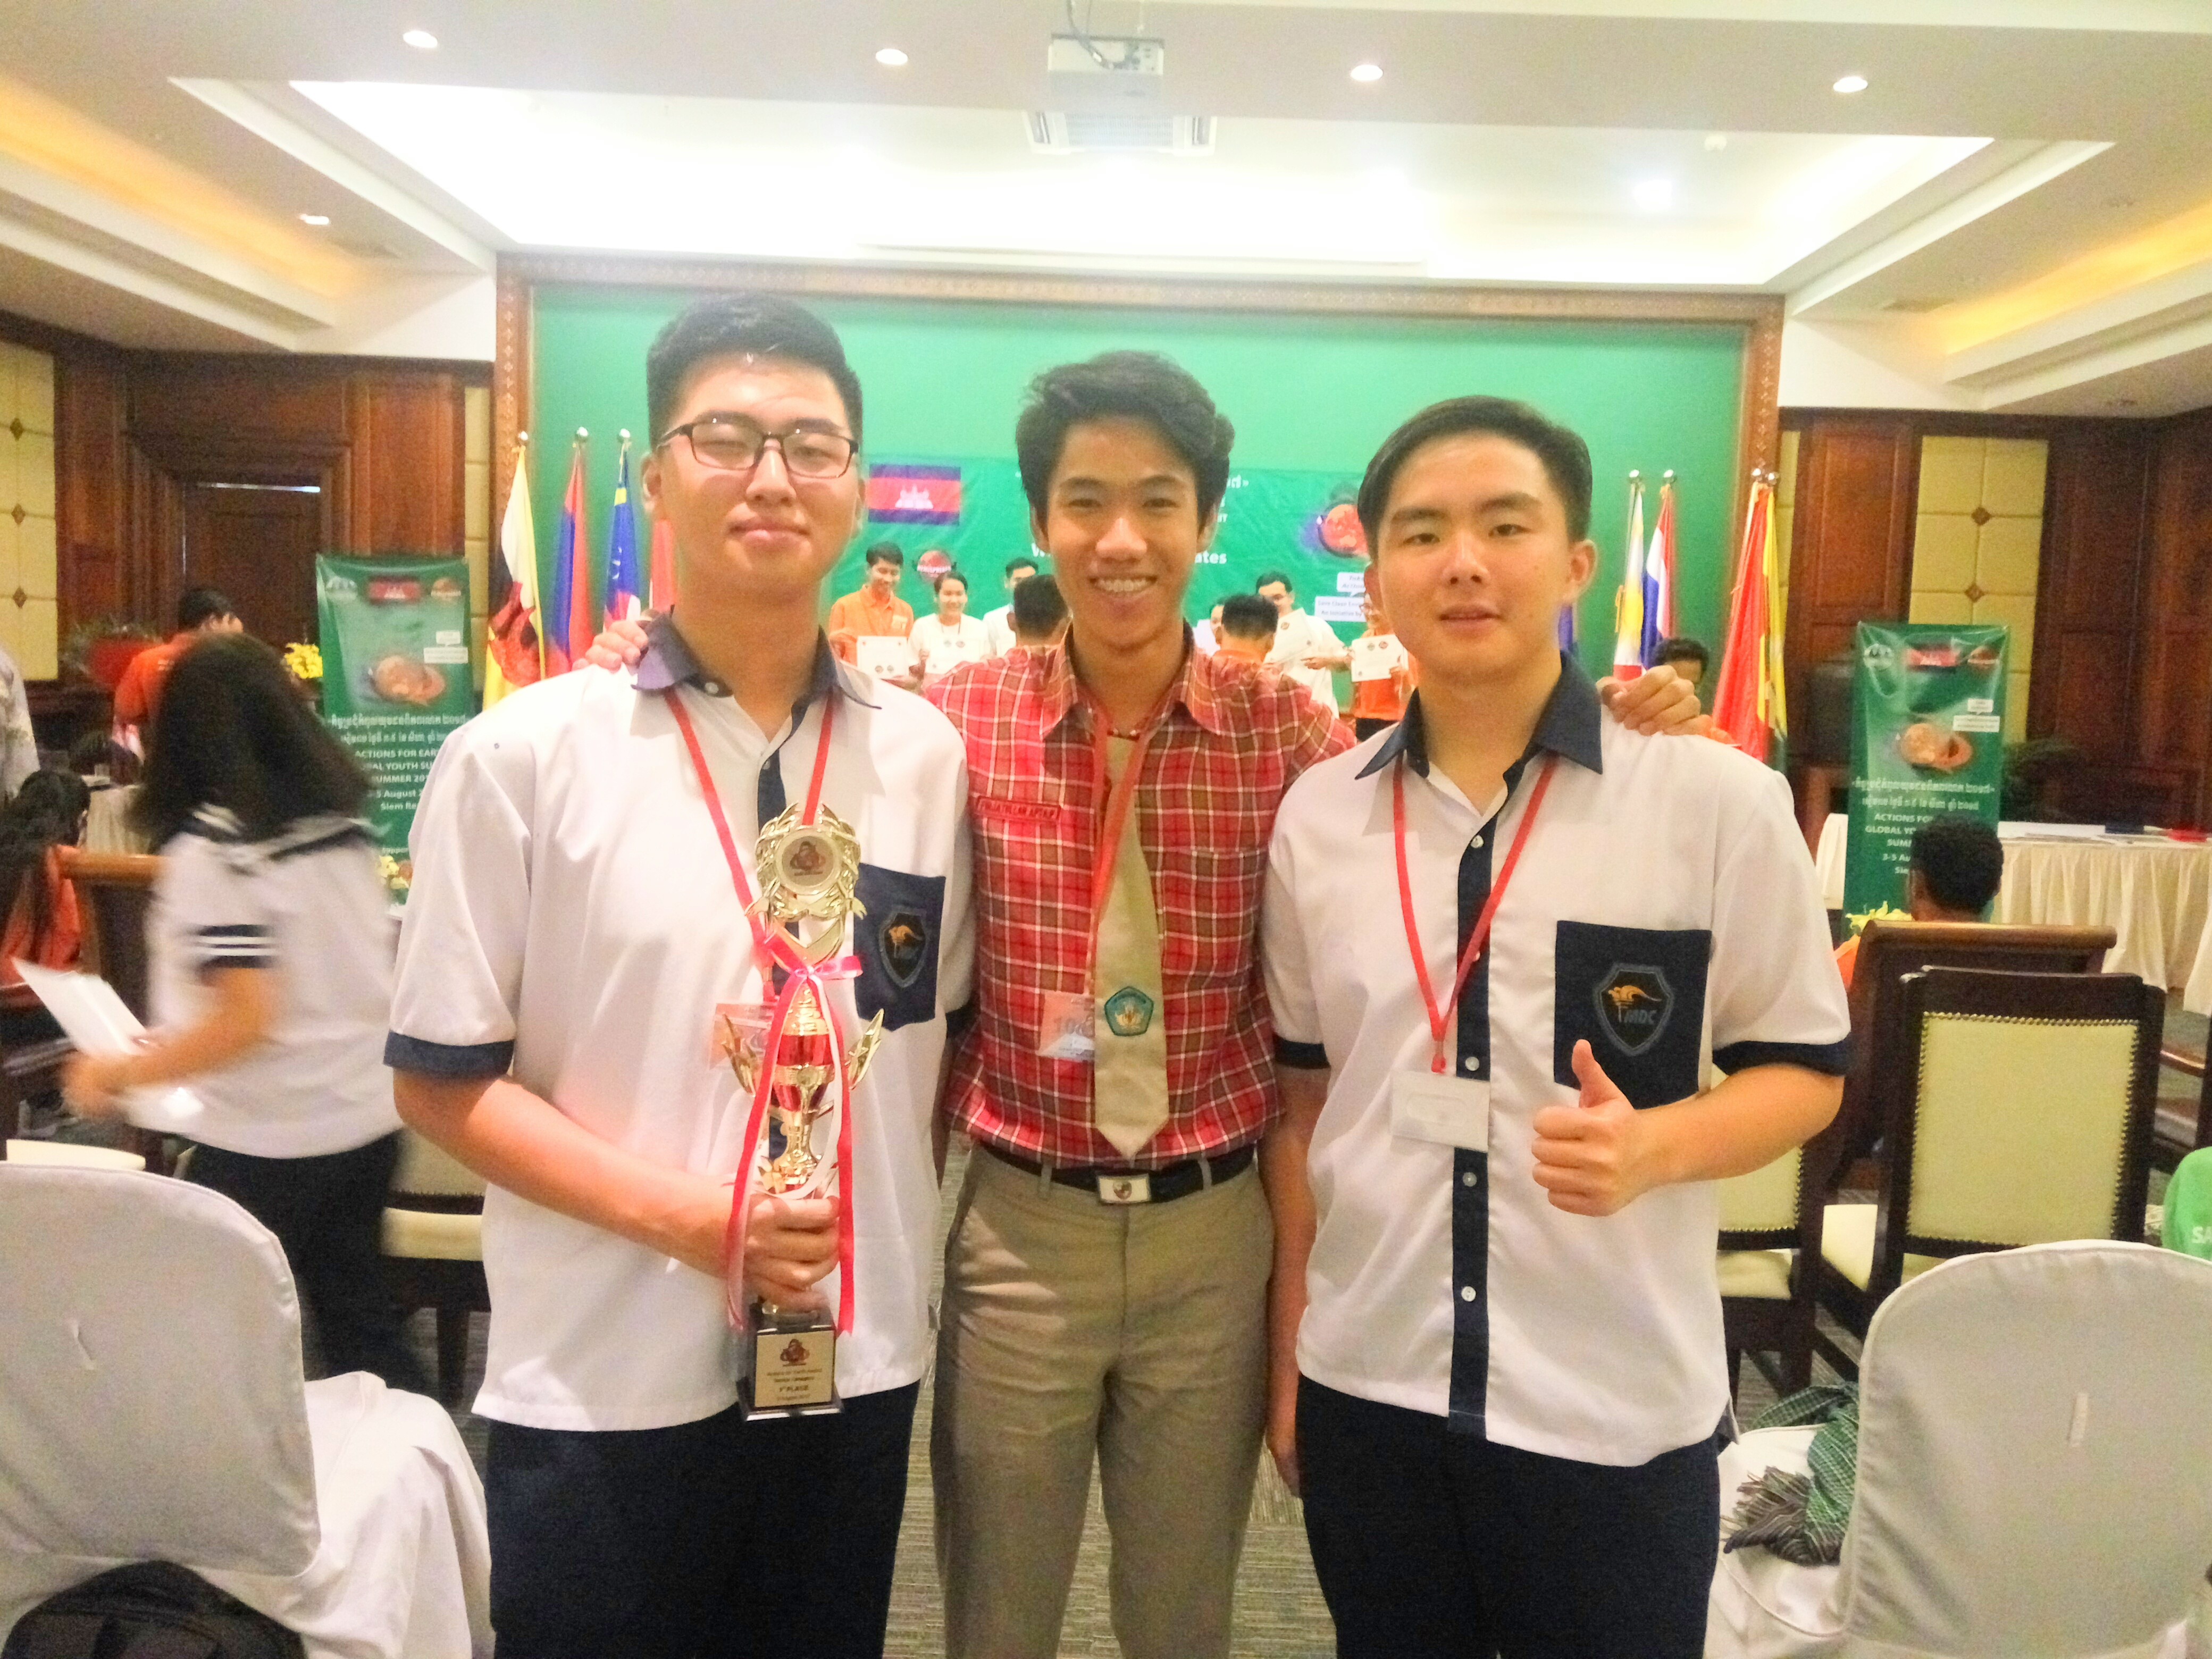 sman 1 magetan GYS 2017 cambodia